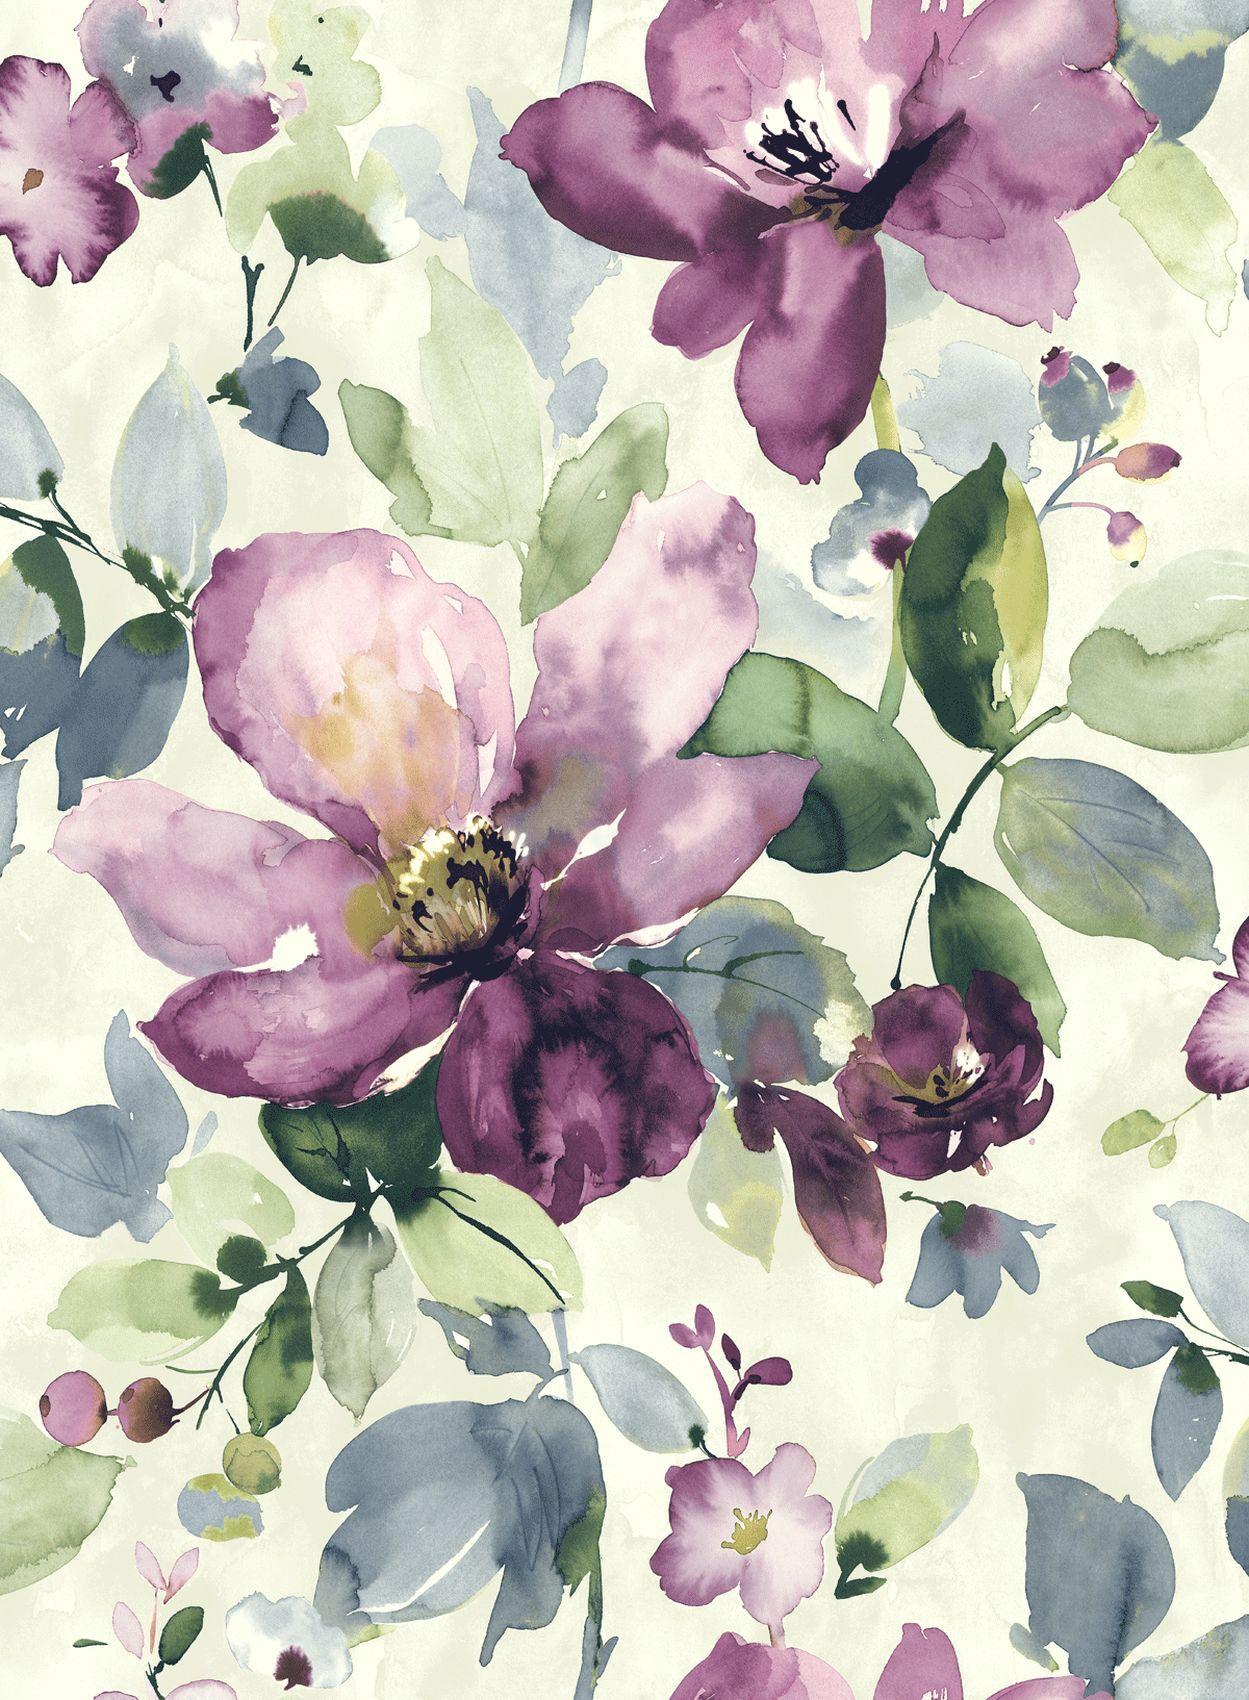 vb10001 villa flora wallpaper book by seabrook sbk22391